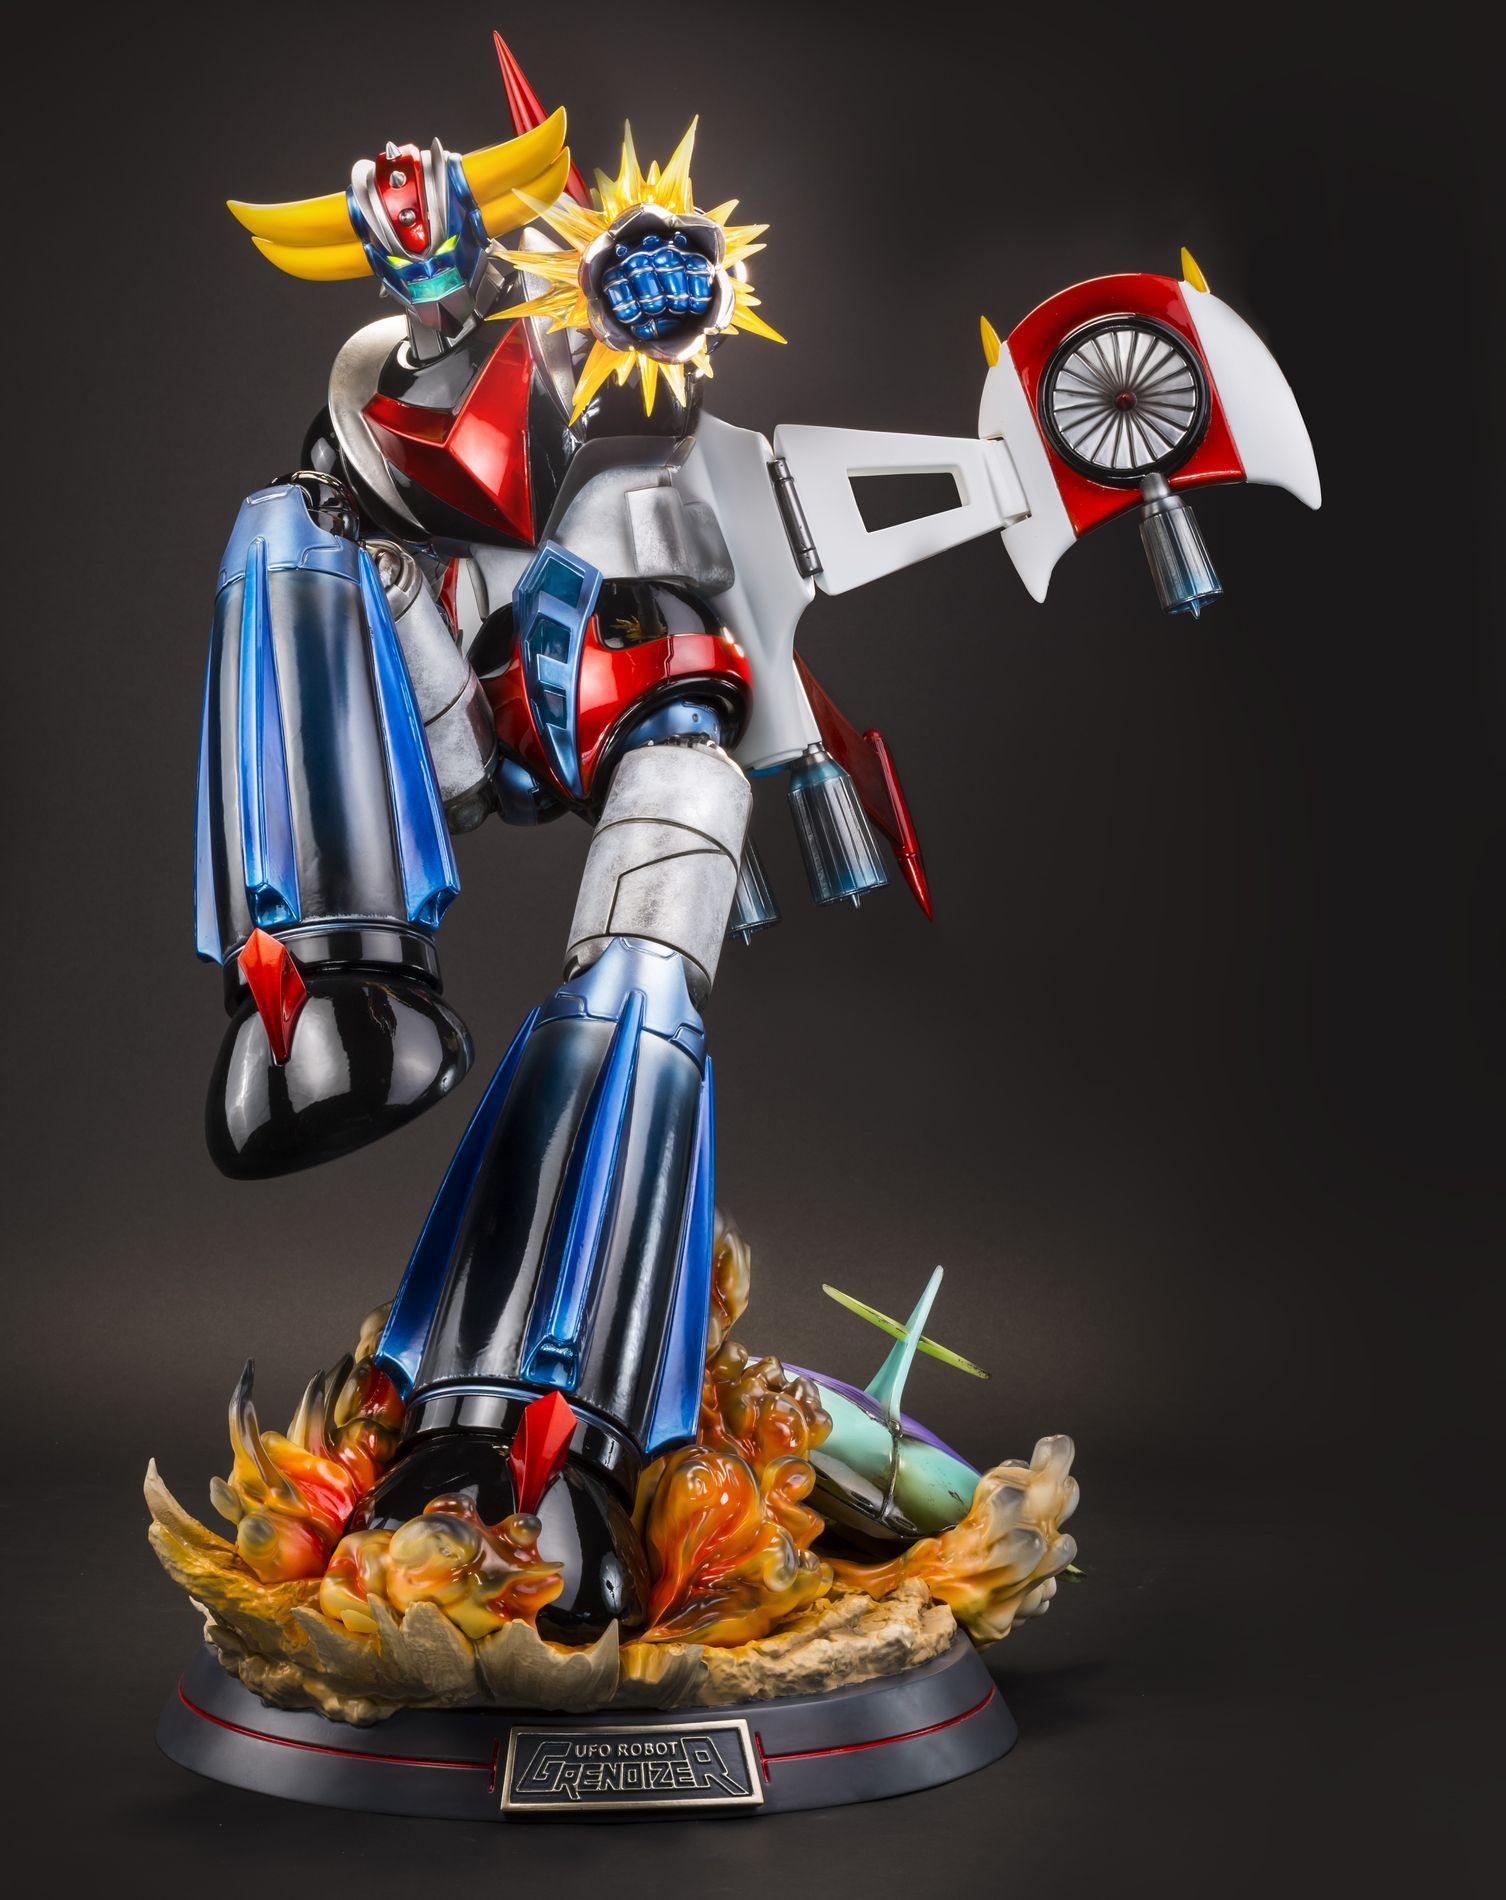 Tsume Art Grandizer HQS Plus Statue